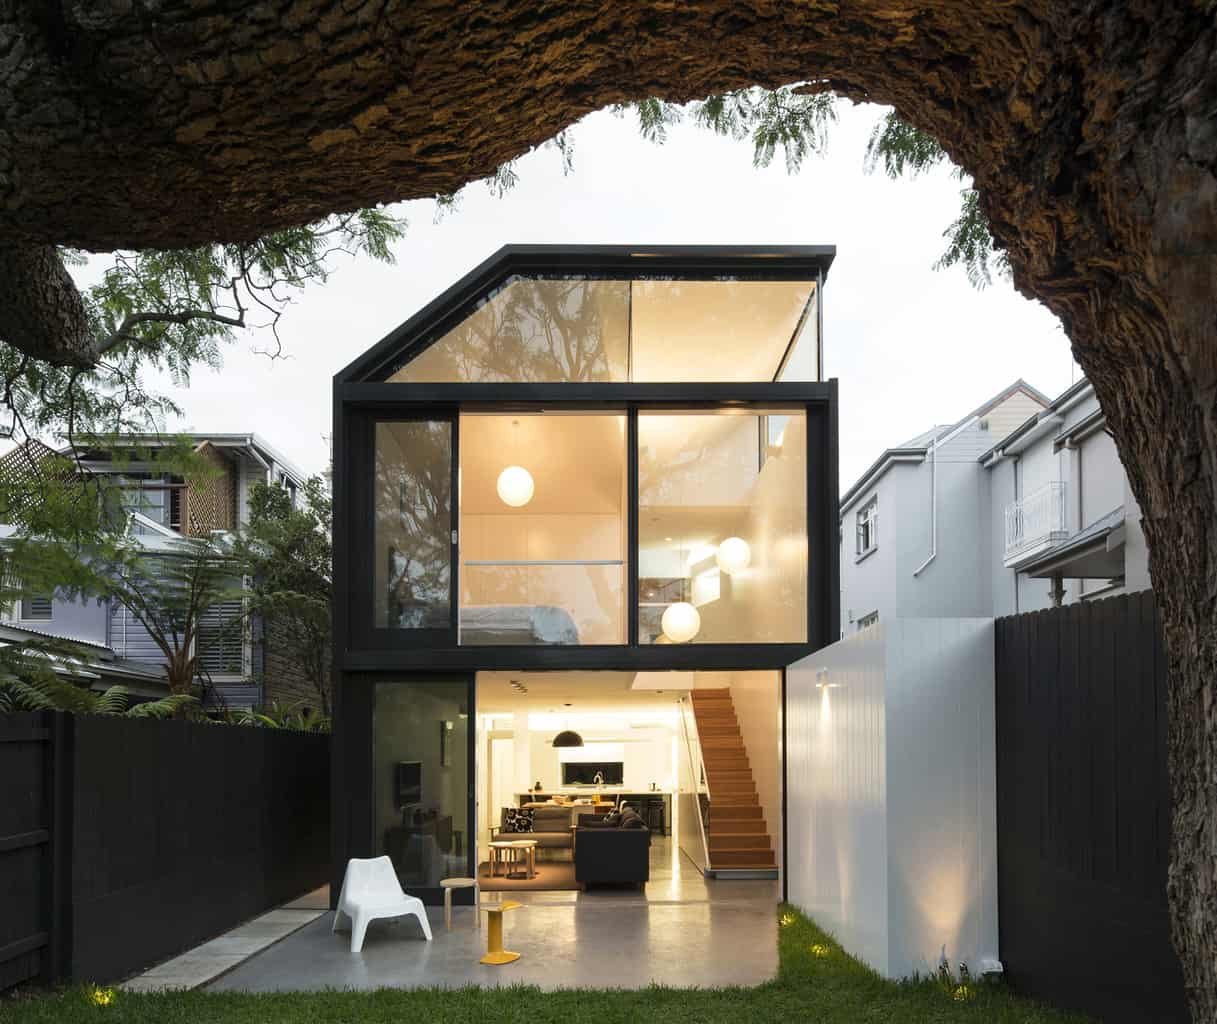 Minimalist geometrical architecture for Sydney abode